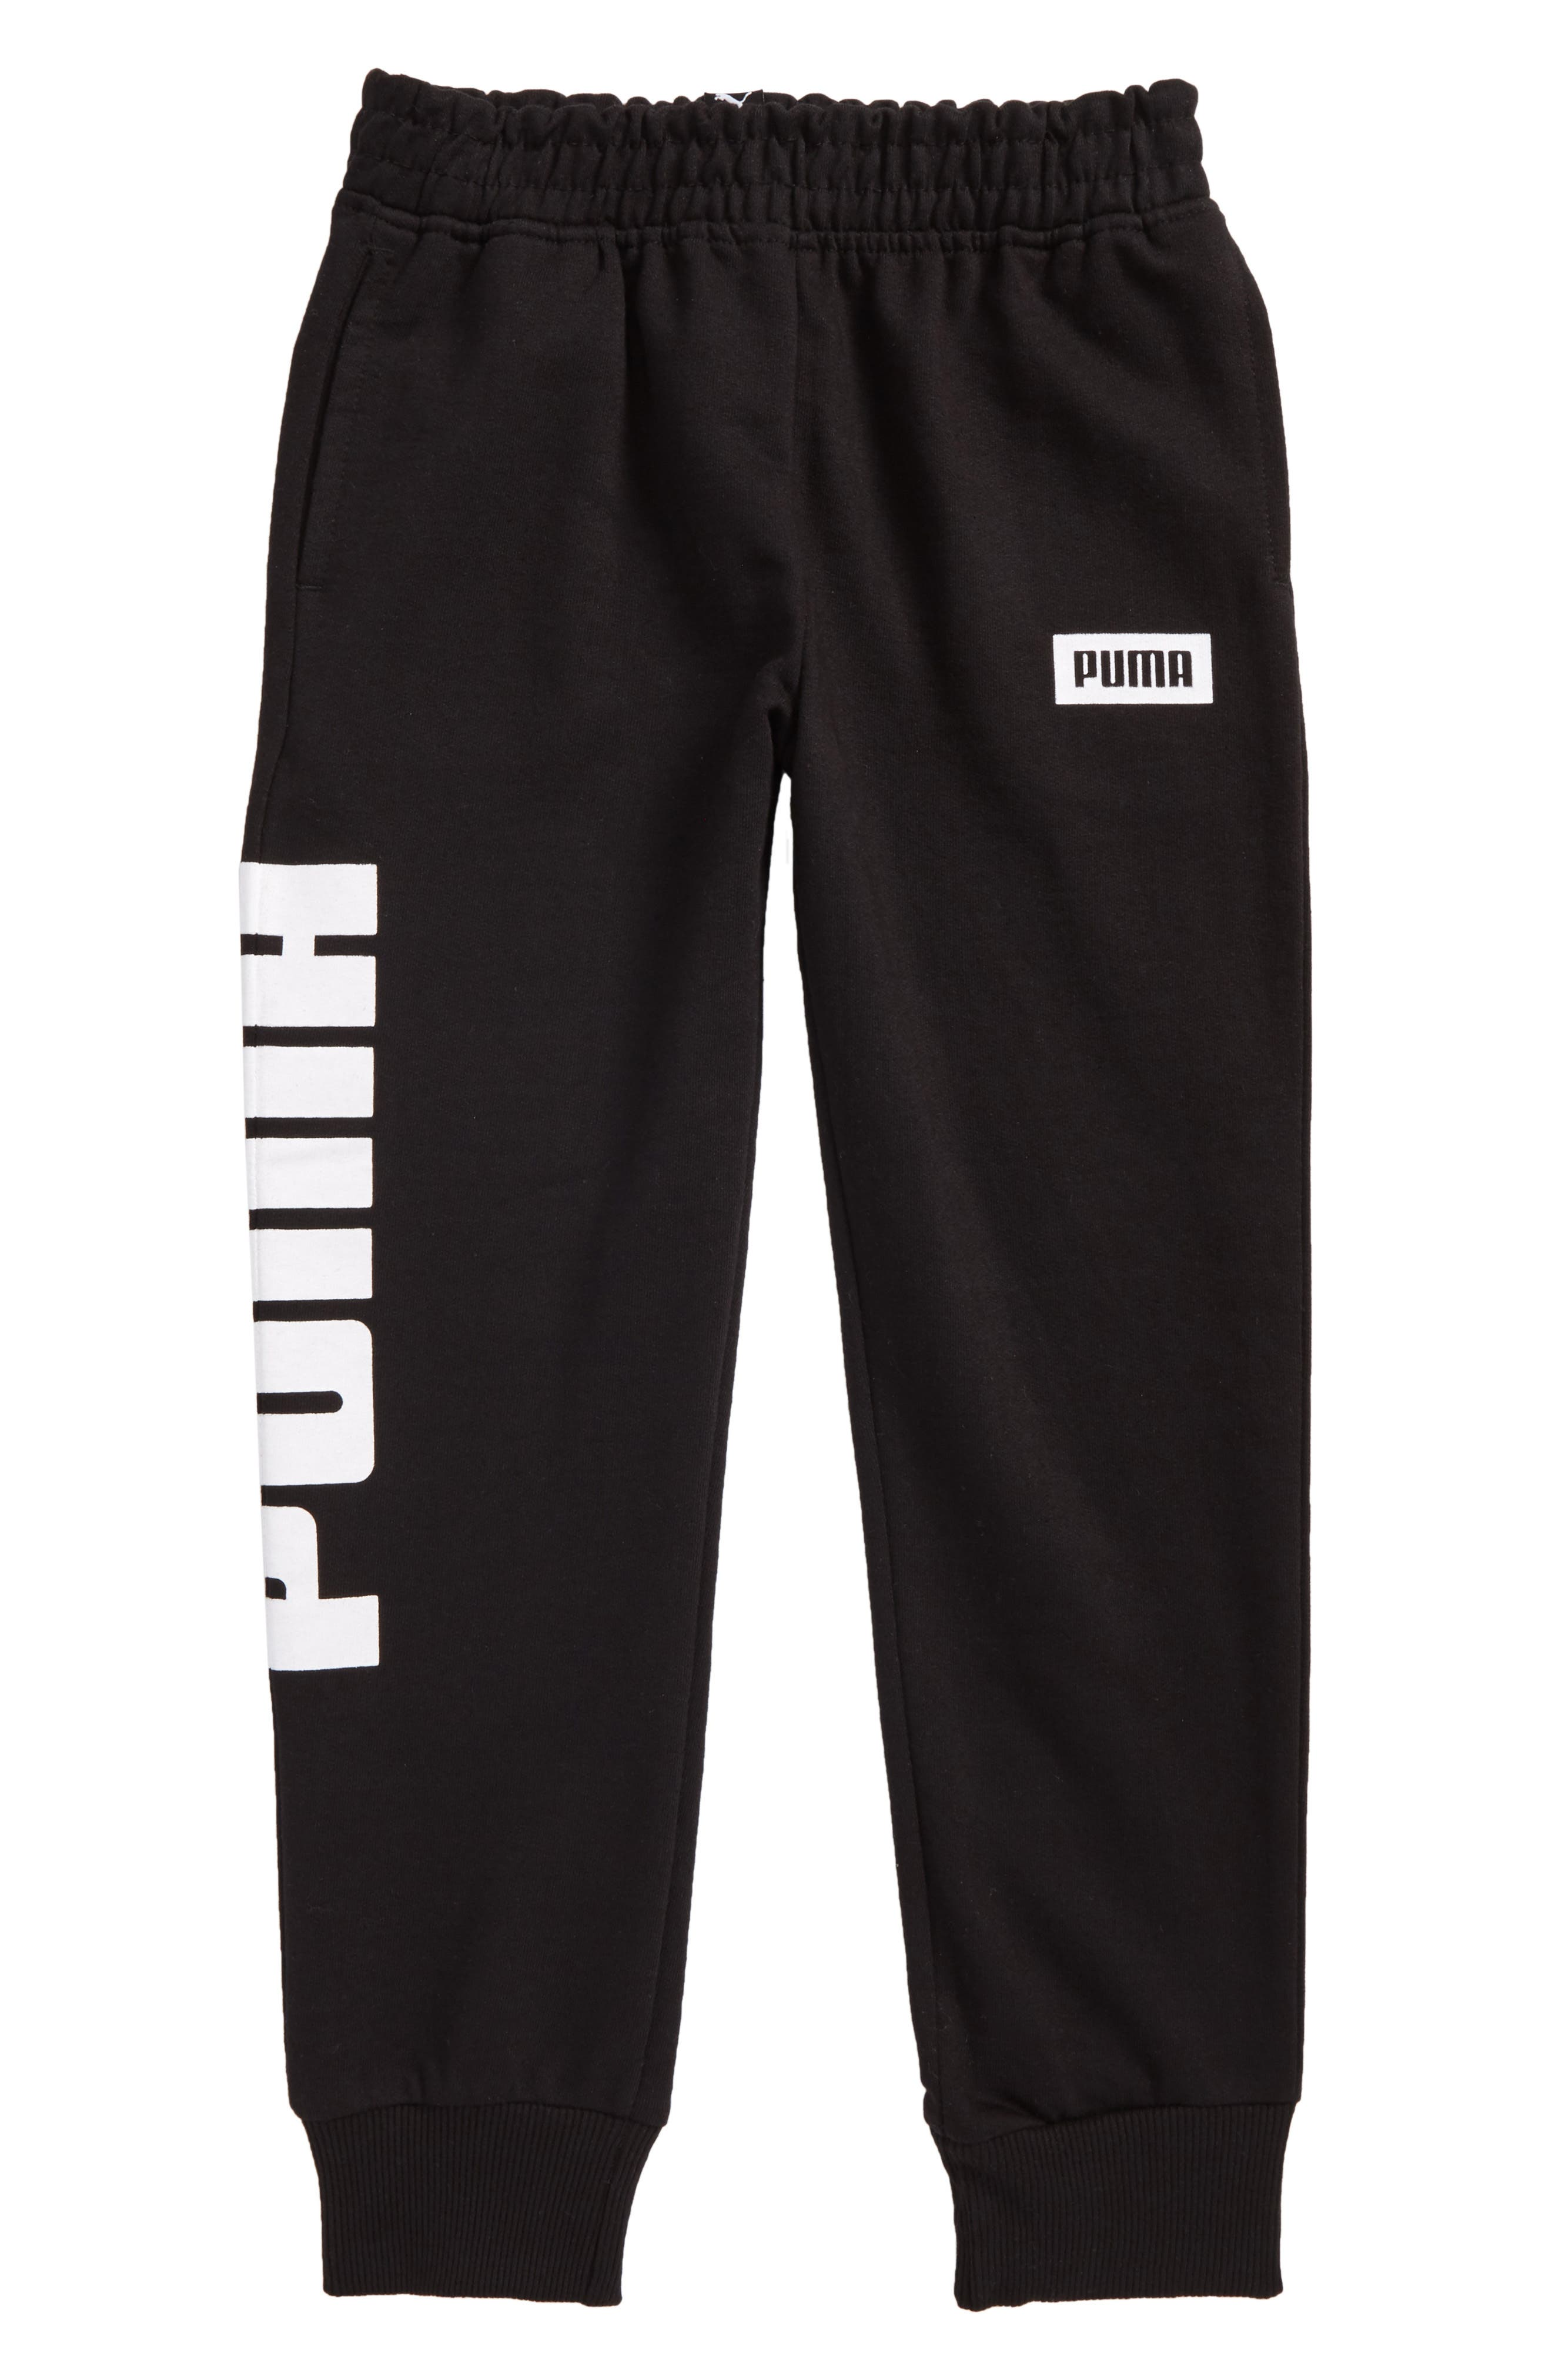 Rebel Jogger Sweatpants,                             Main thumbnail 1, color,                             Puma Black